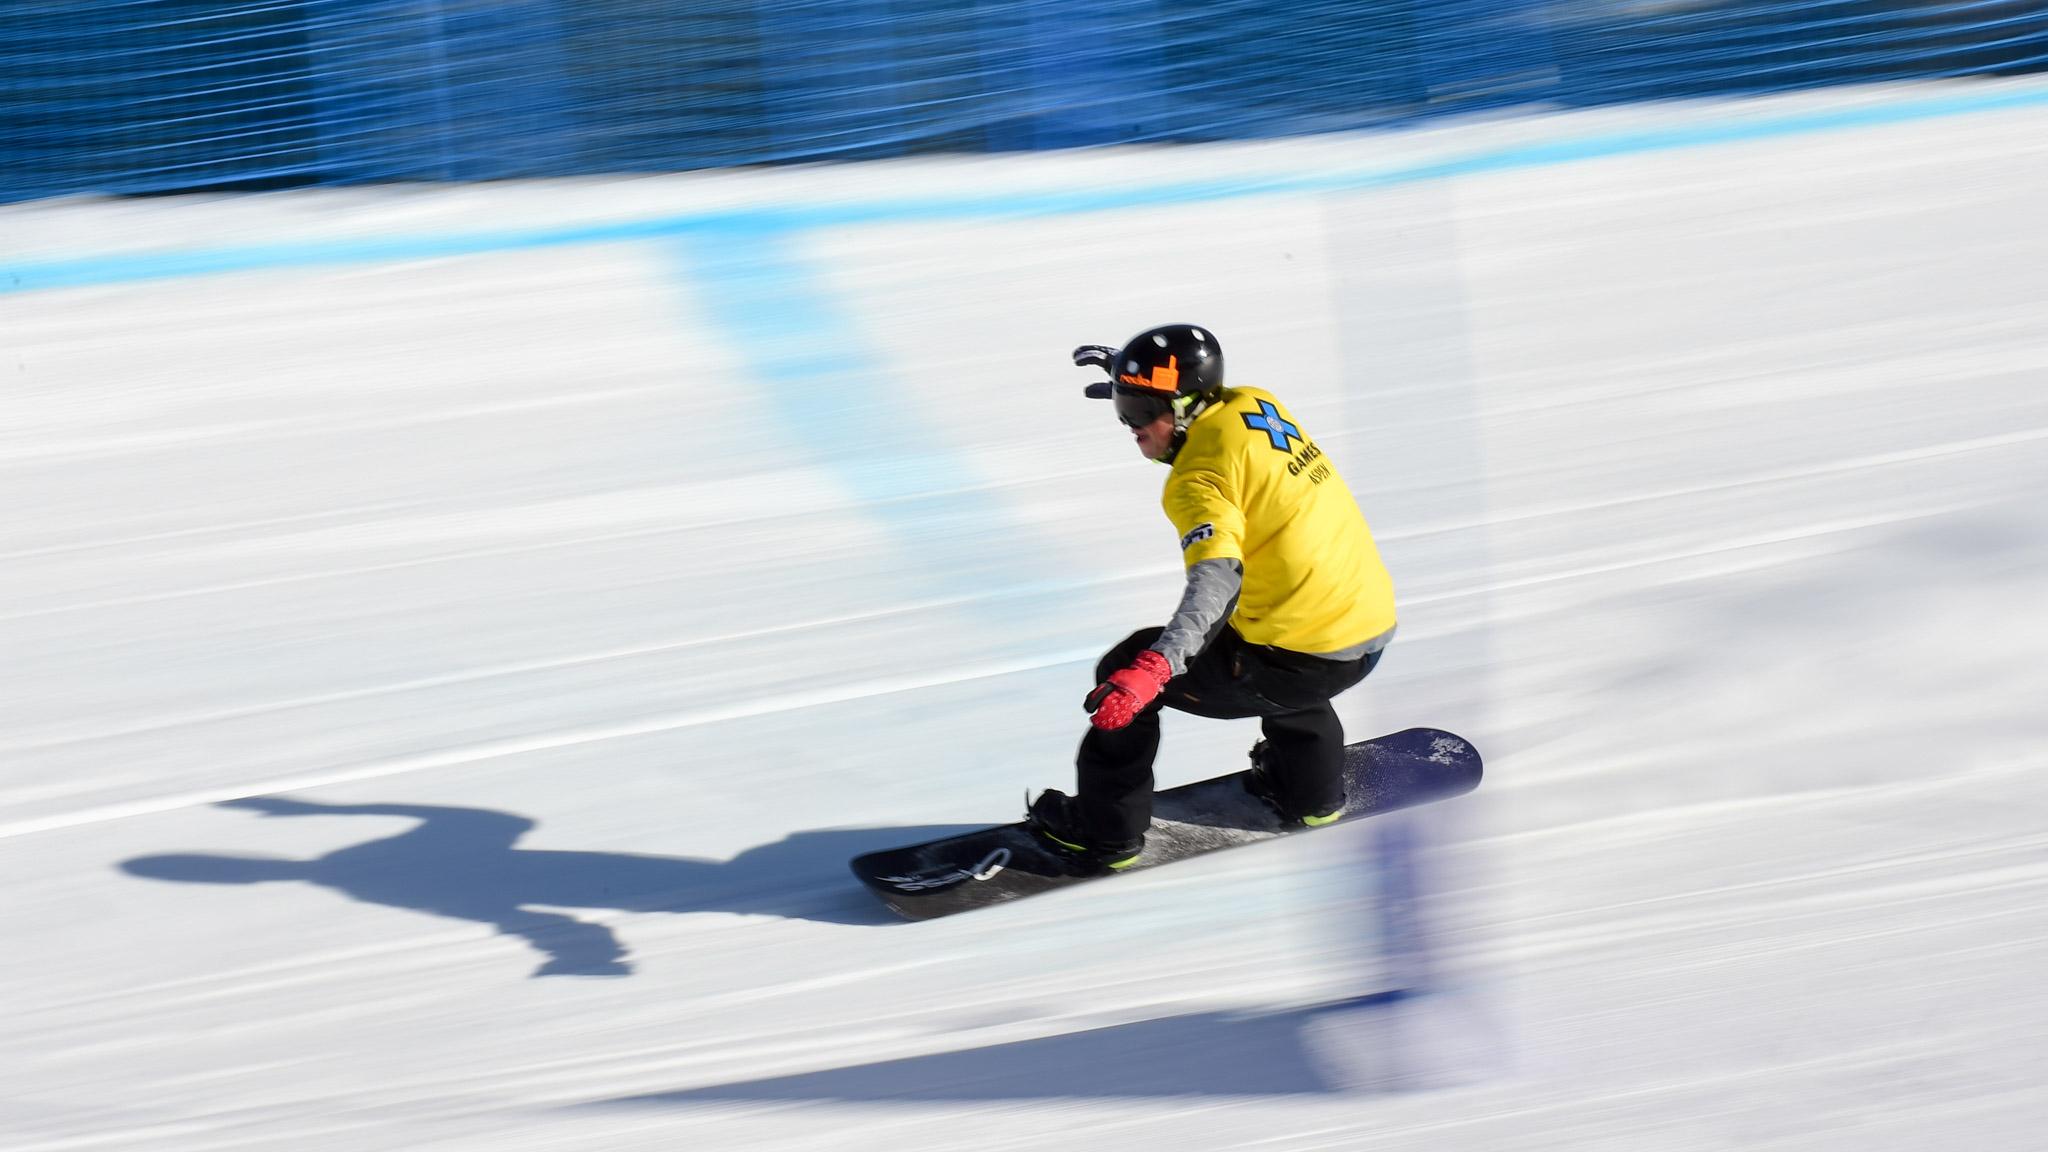 Snowboarder X Adaptive